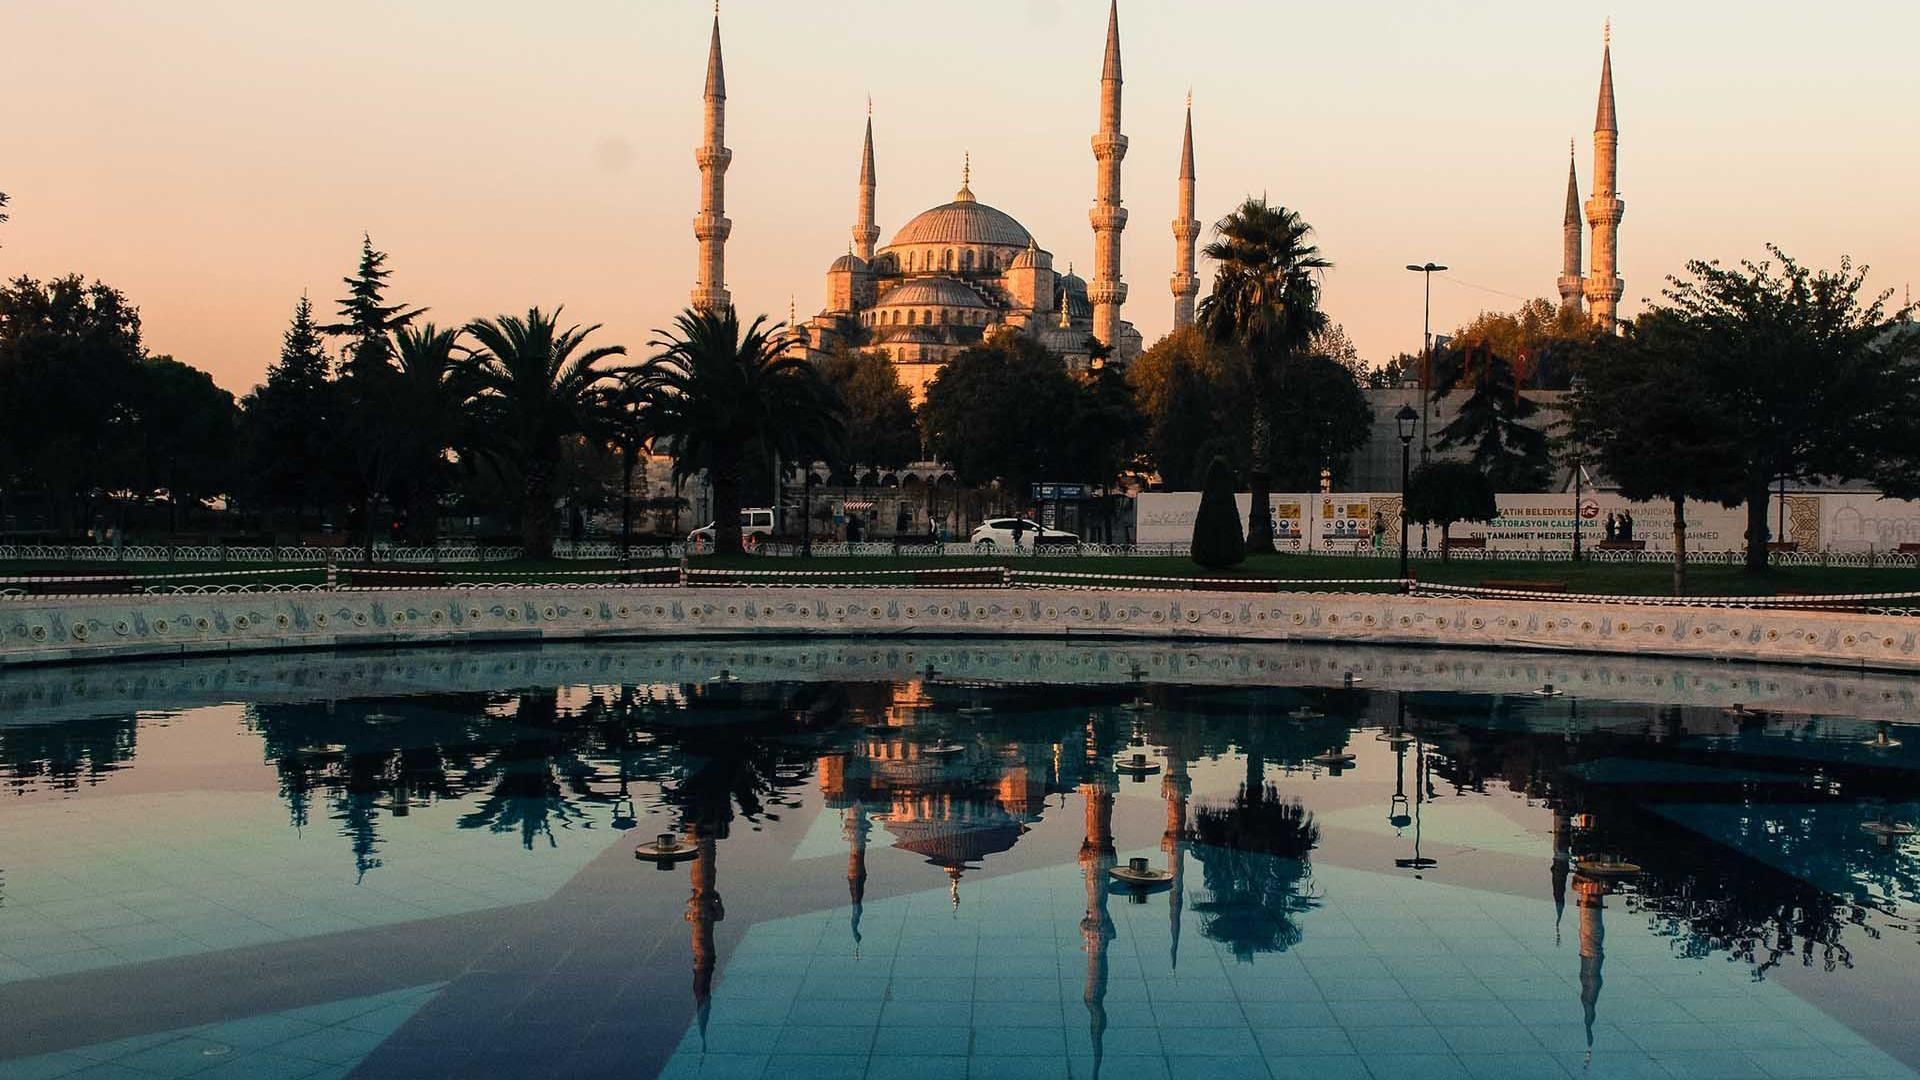 Istanbul Turkey Turkiye Wallpaper 014 Istanbul Turkiye Turkey Bogazicikoprusu Sultanahmetcamii Ayasofya Halic Istanbul Tours Istanbul Blue Mosque